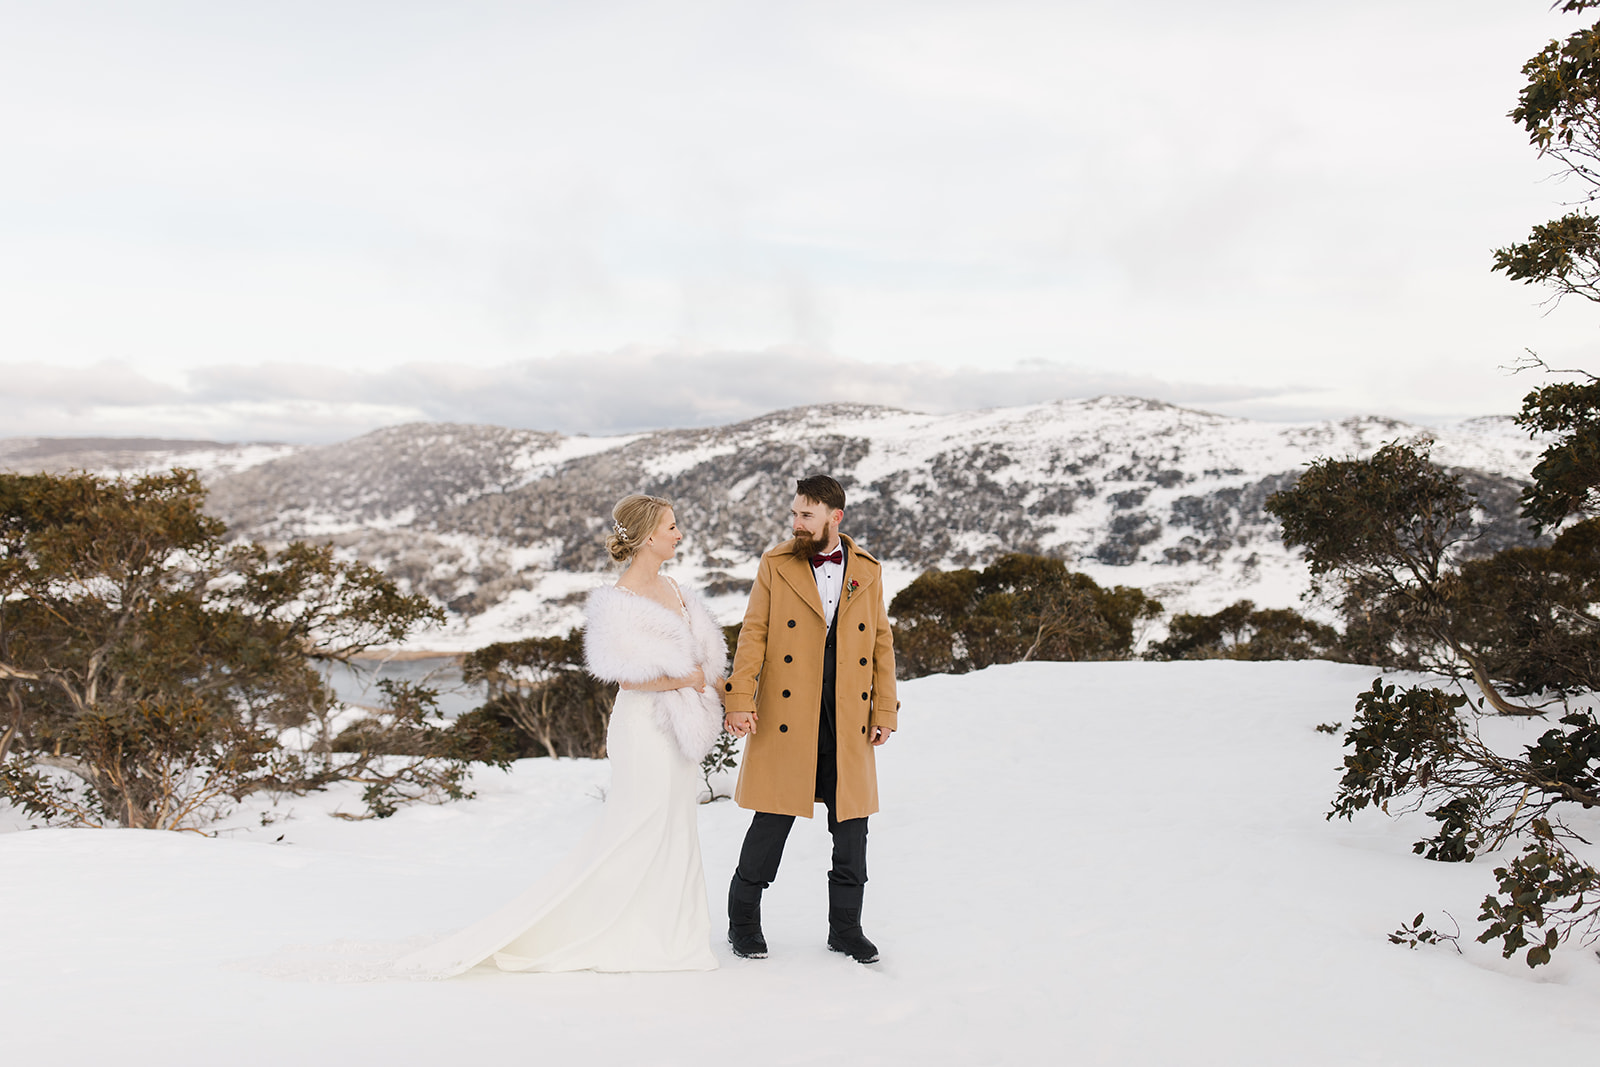 LOVE: NADINE + CHRIS |  SNOWY MOUNTAIN WEDDING QT FALLS CREEK VIC